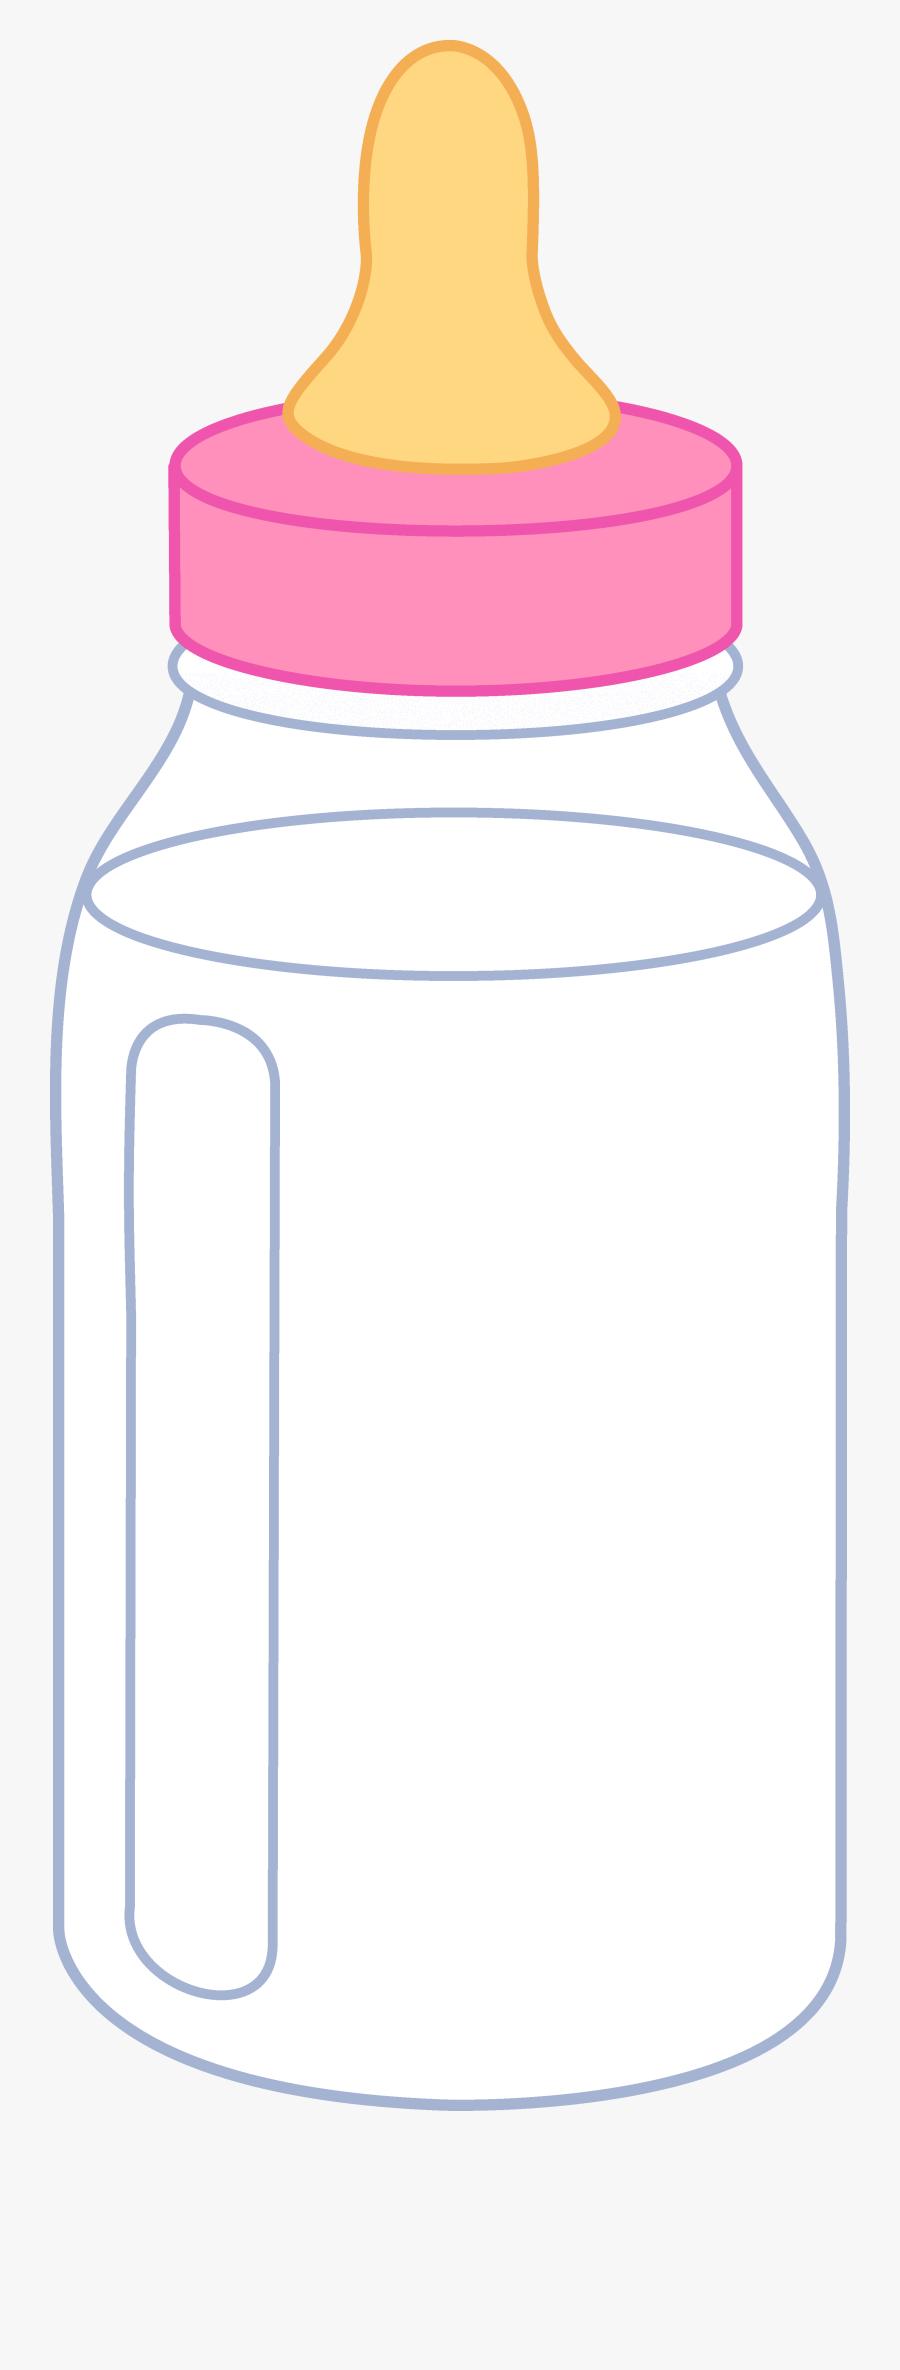 Cartoon Baby Bottle - Baby Bottles Clip Art Free, Transparent Clipart